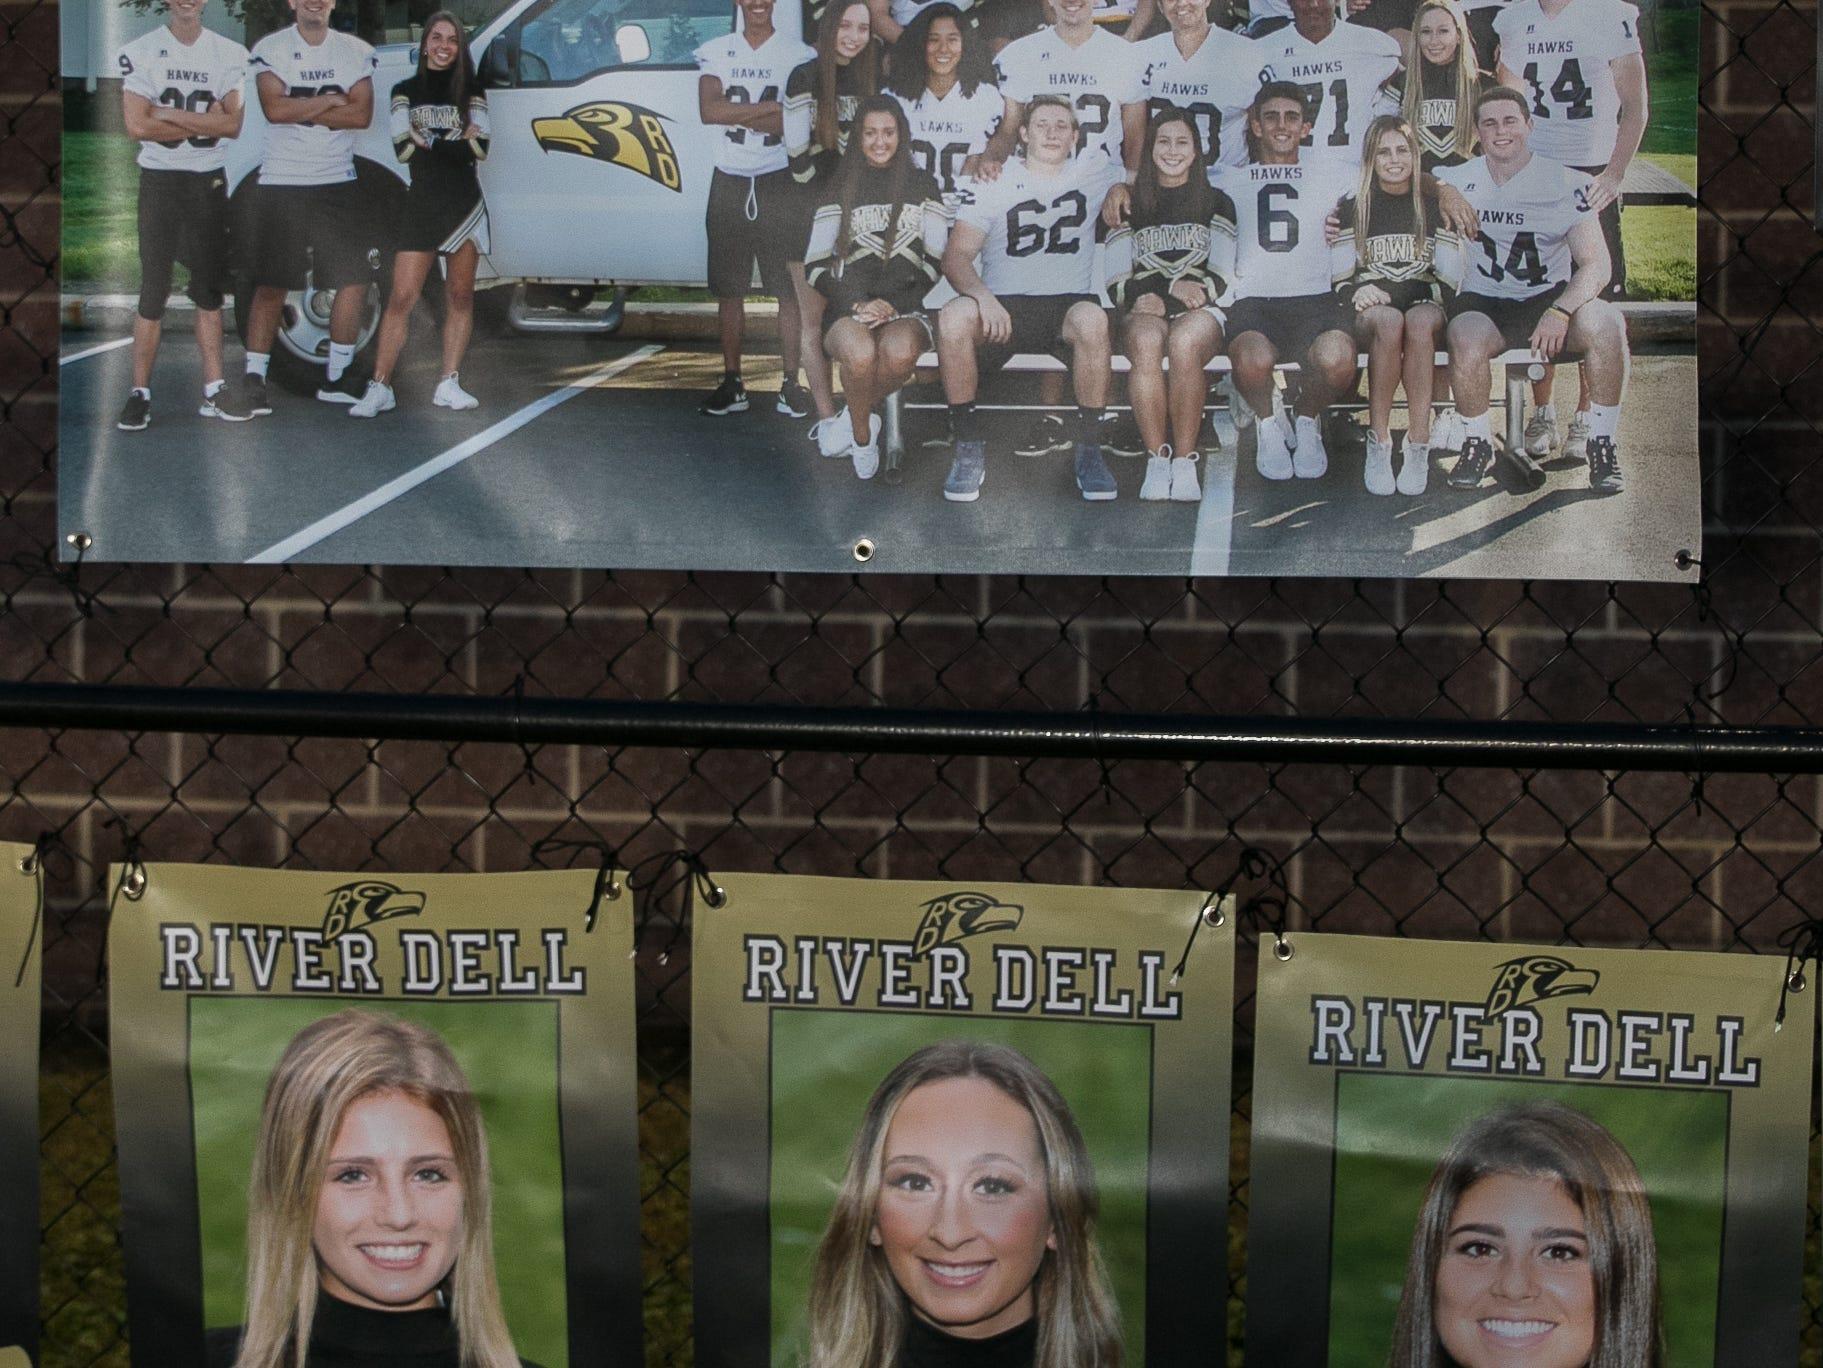 Fans at the Paramus High School versus River Dell High School Football game held at River Dell High School. 10/19/2018